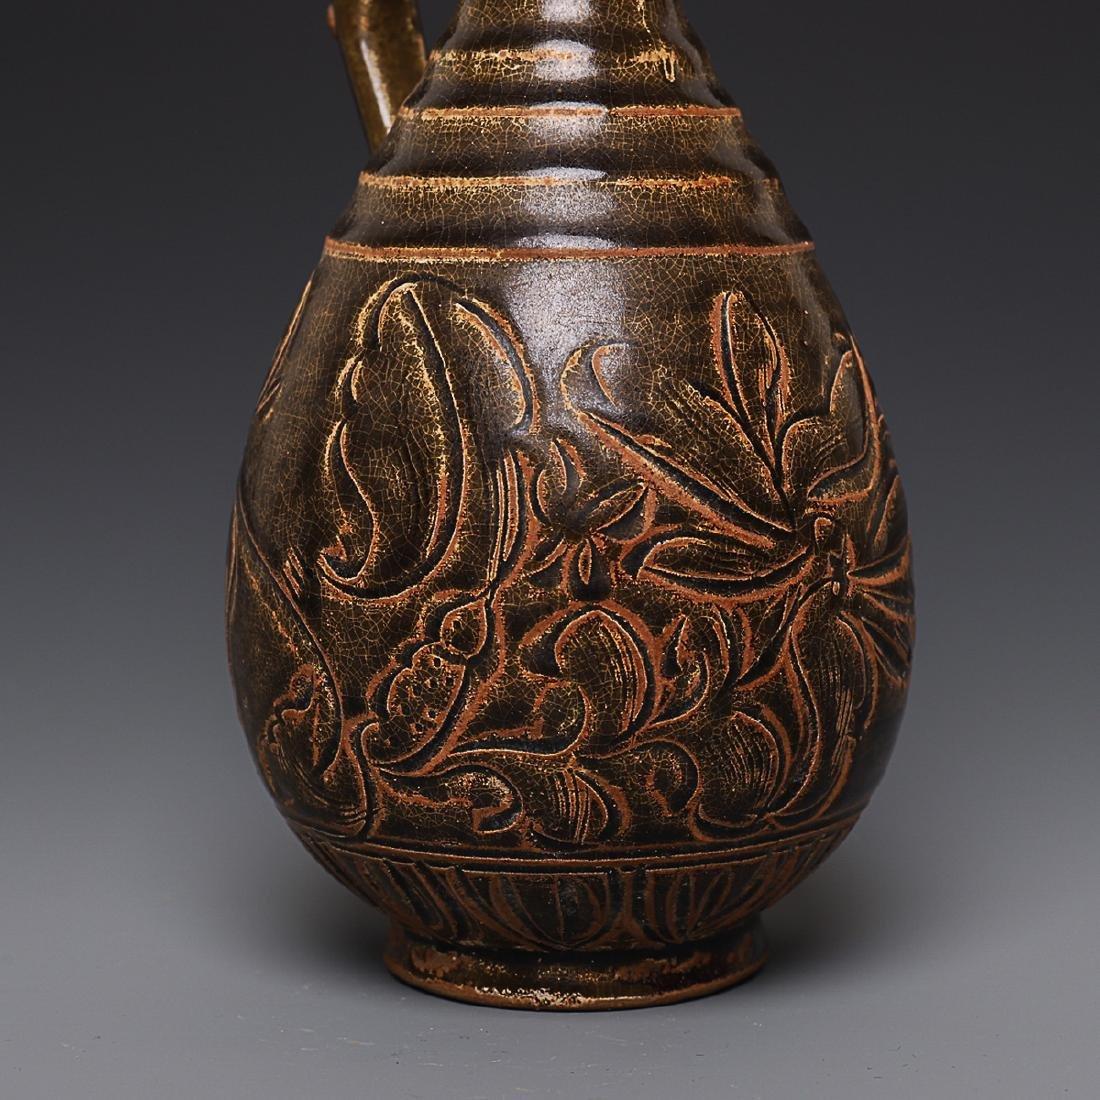 Vintage Chinese Porcelain Pot - 4